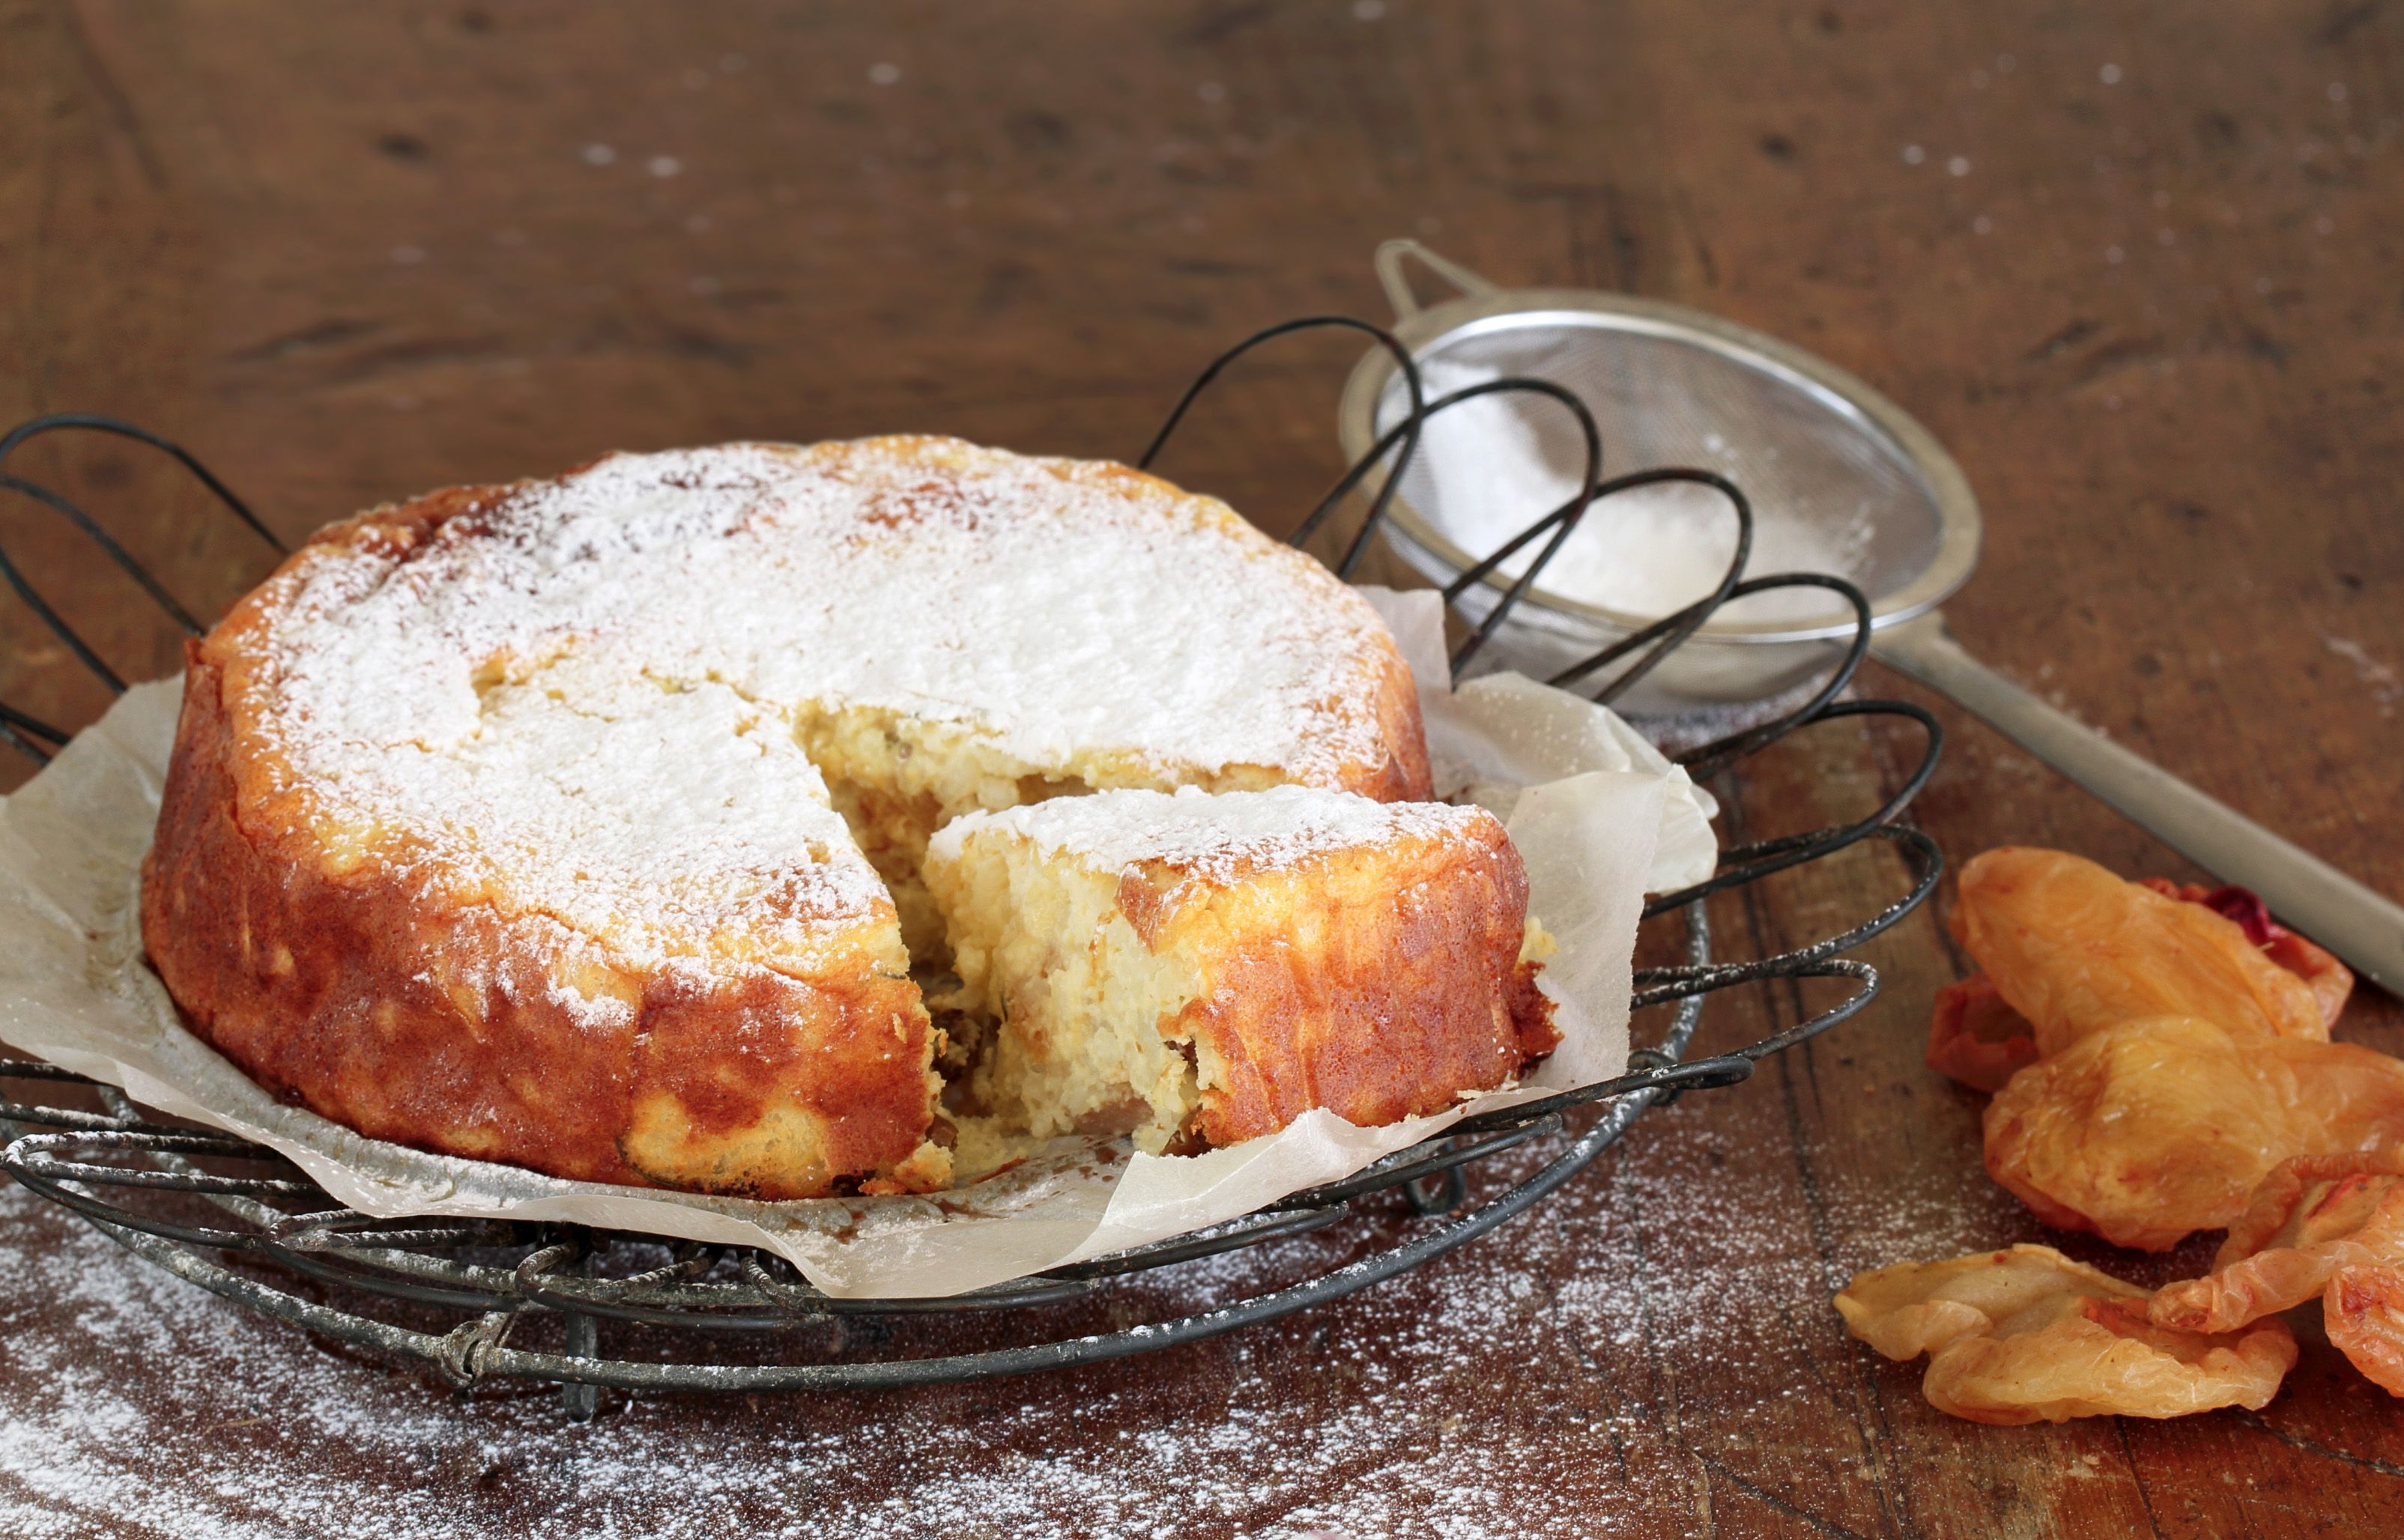 13 best cake recipes images on Pinterest